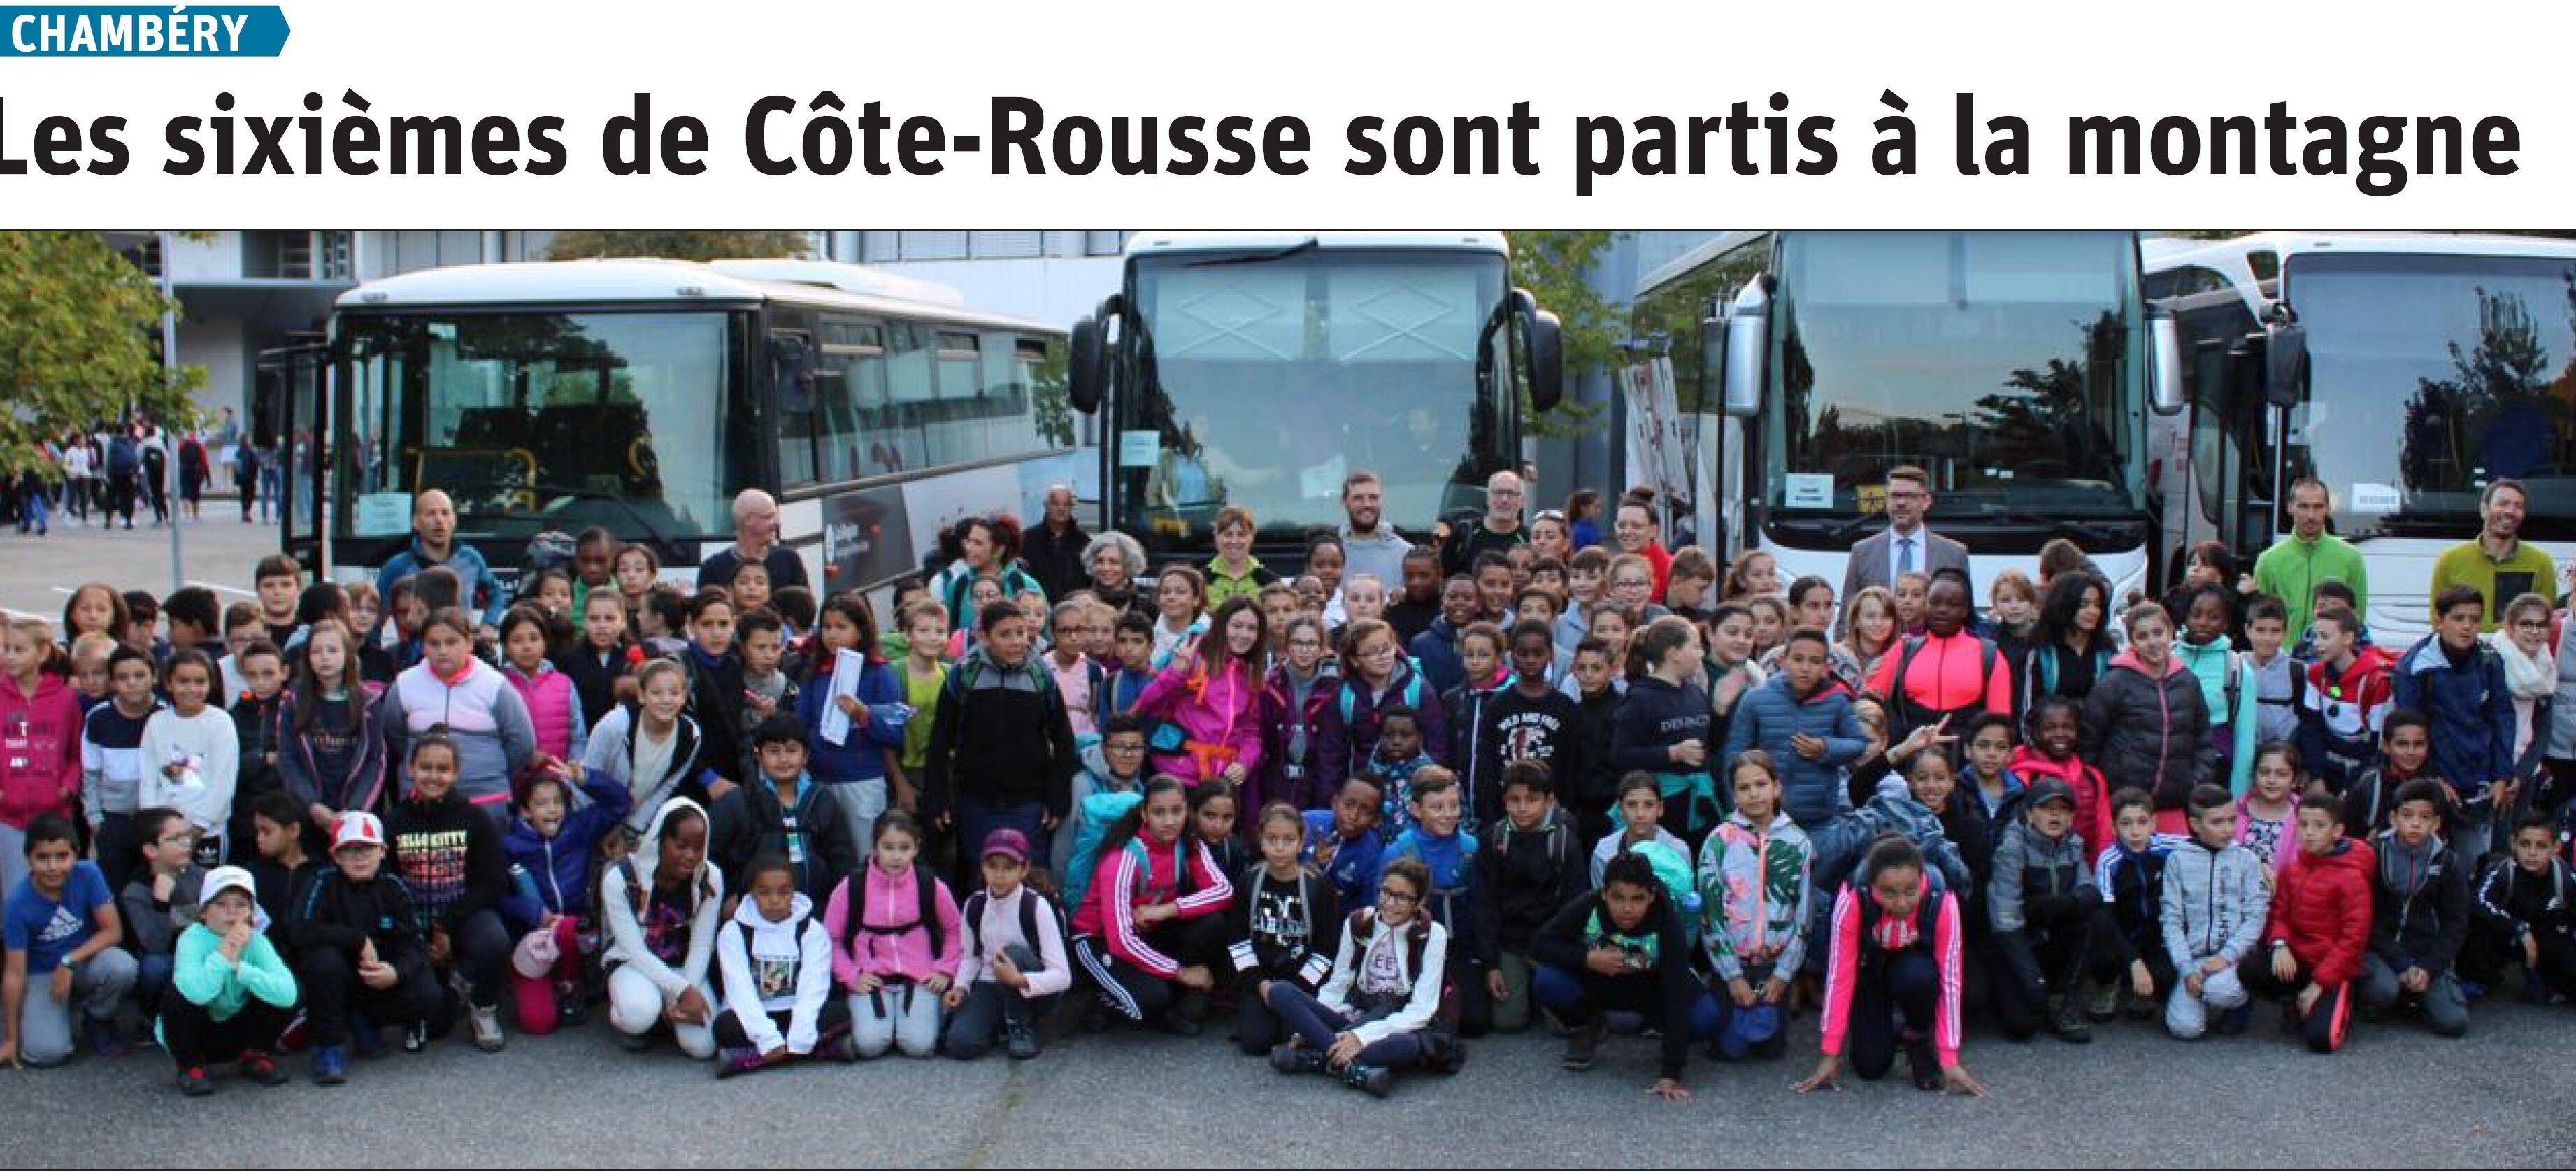 Collège-à-la-Montagne.jpg